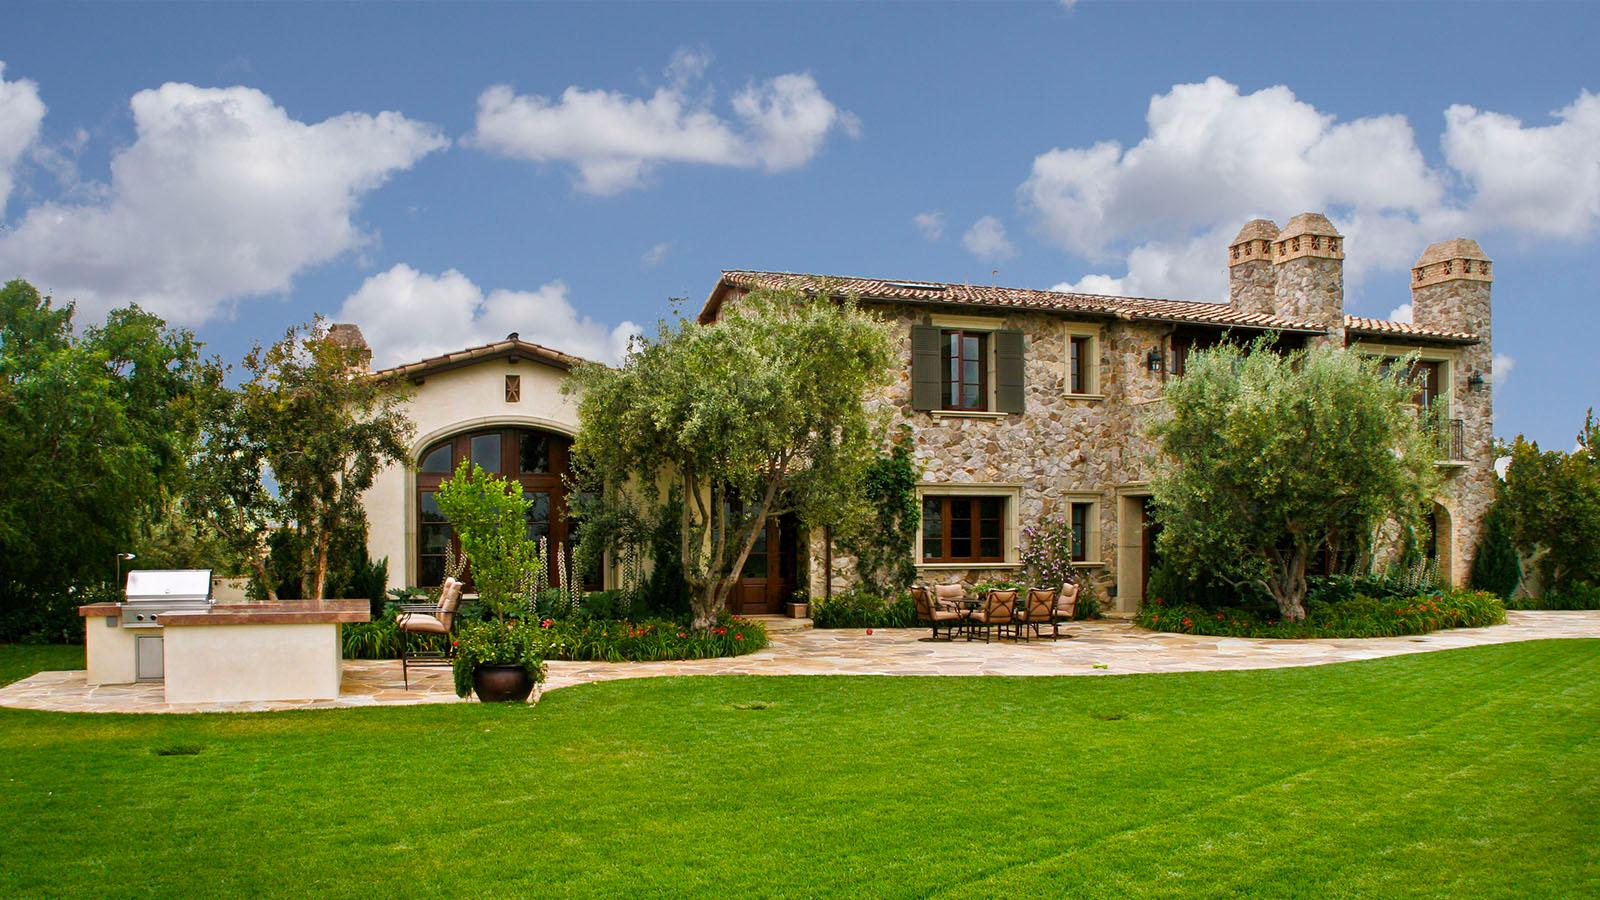 Gardner residence gallery irvine ca robert hidey - Residence calistoga strening architects californie ...